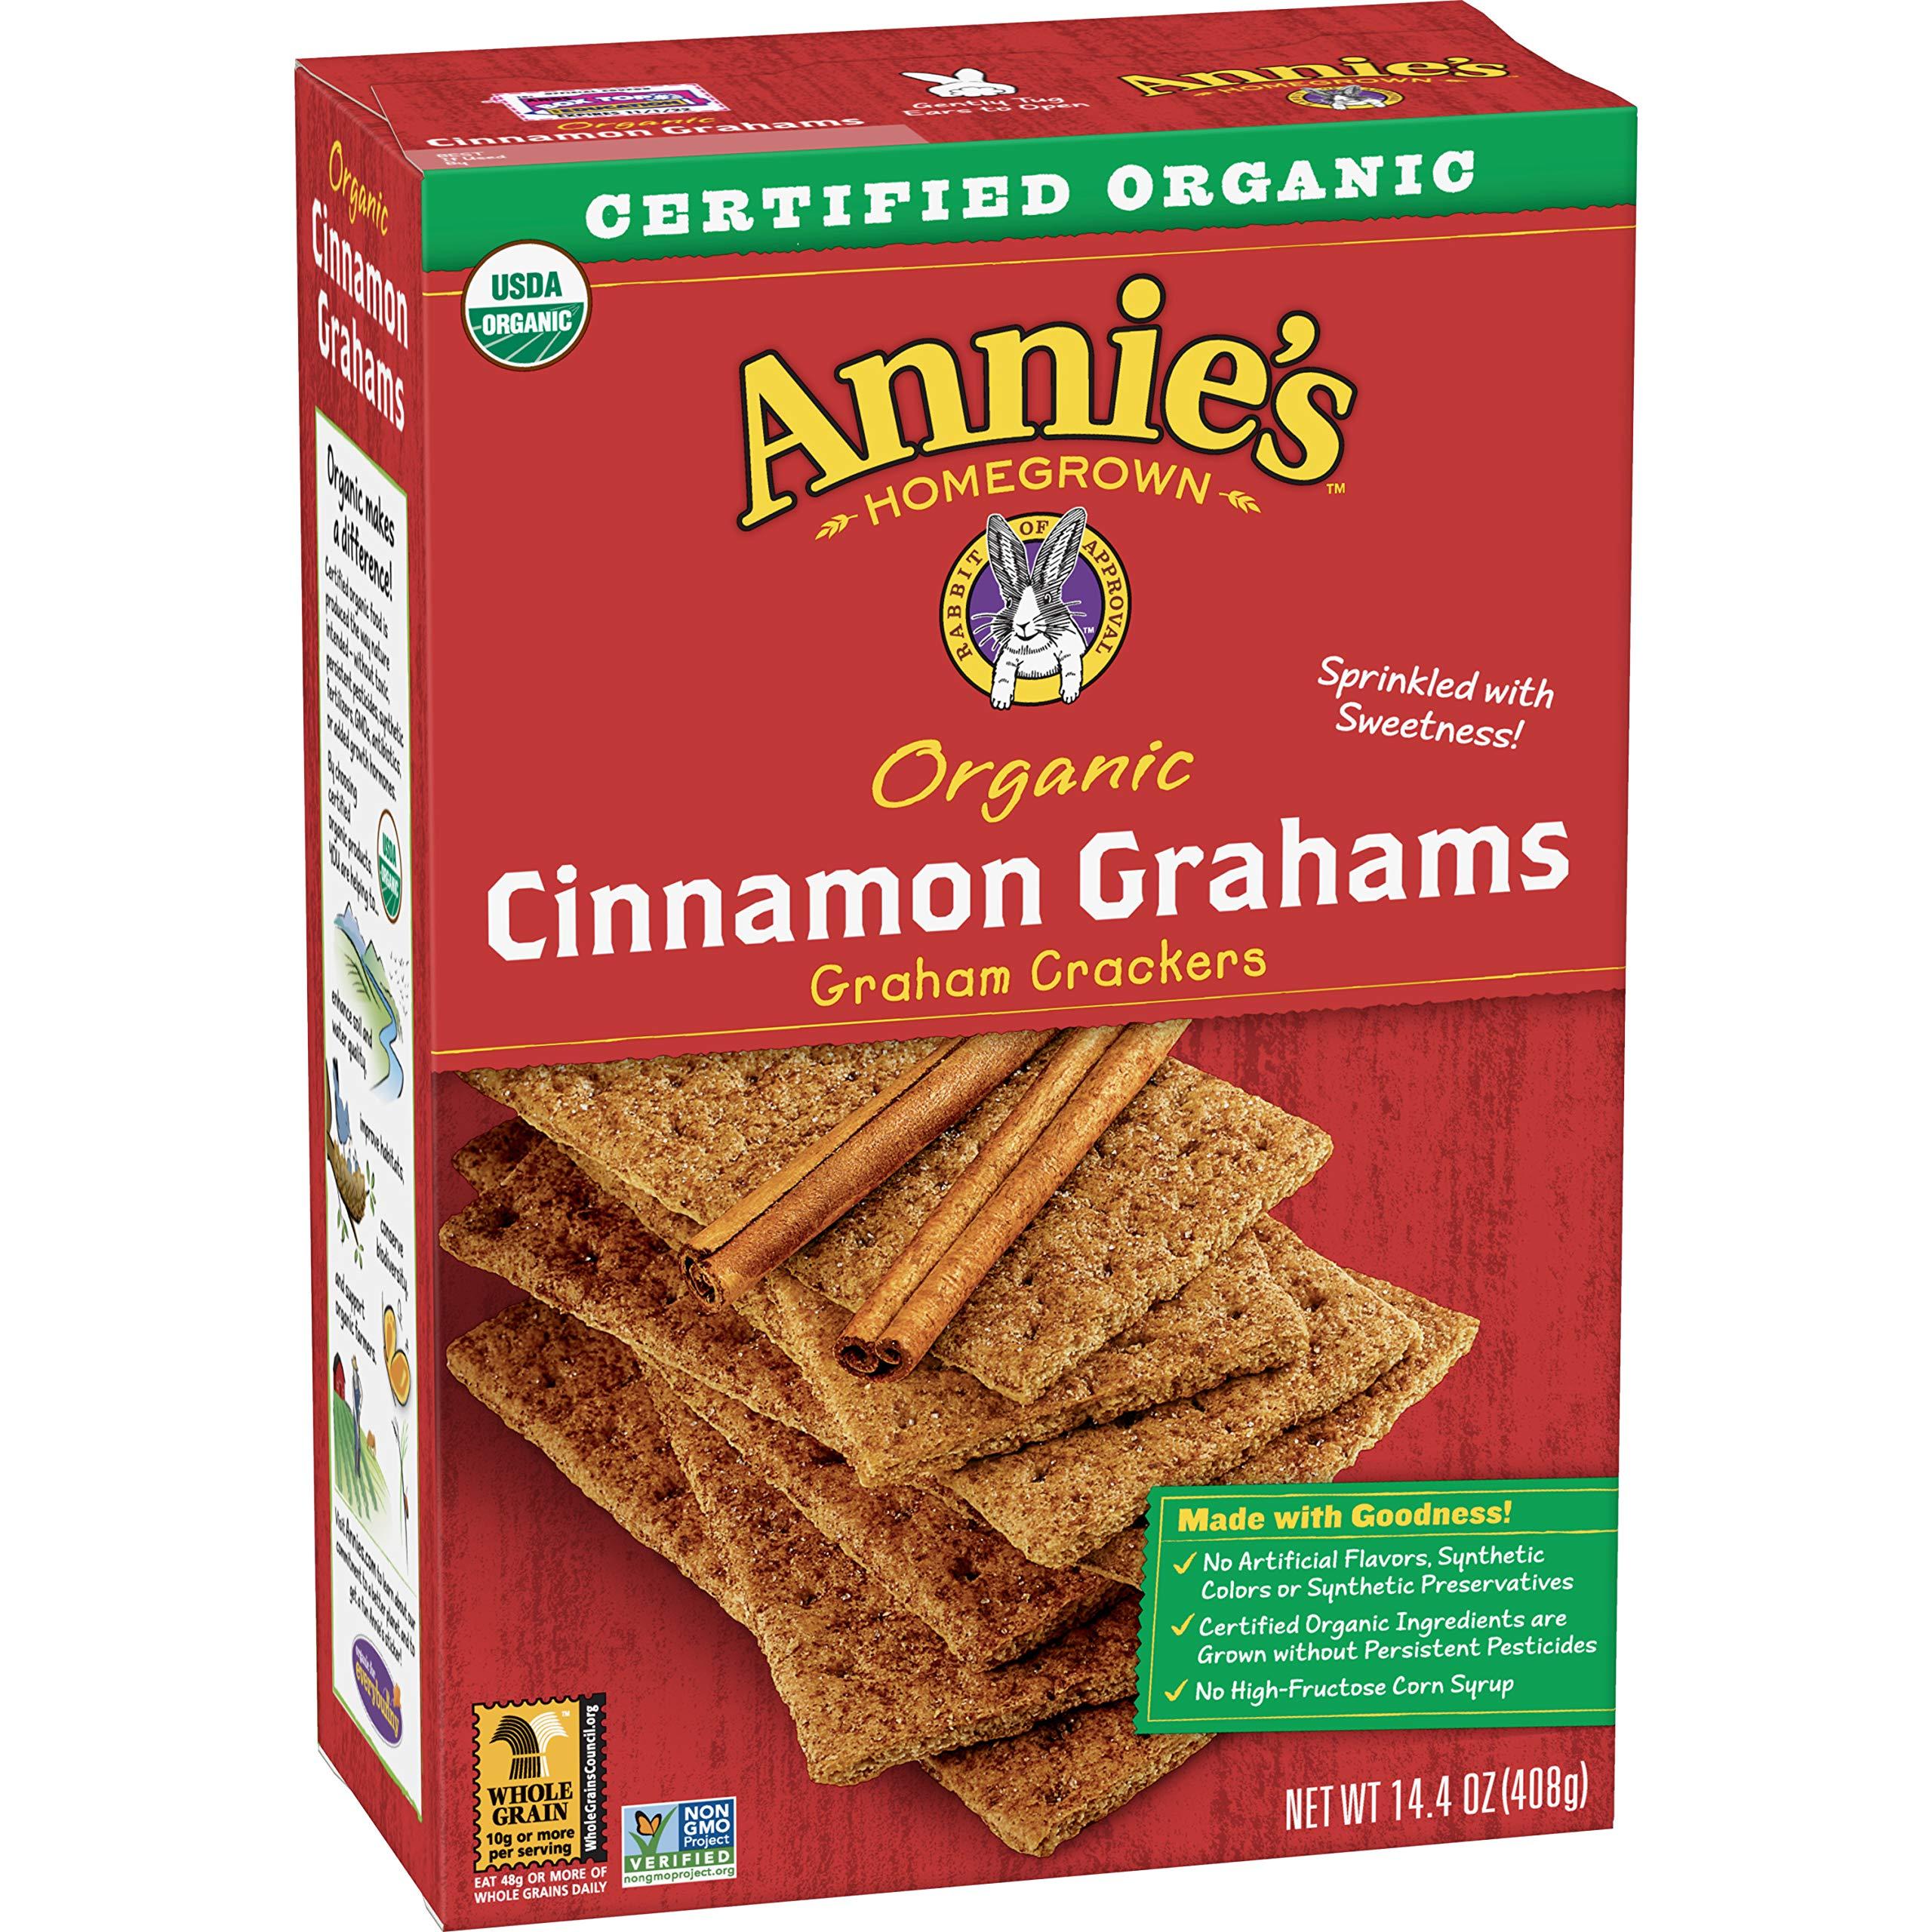 Annie's Organic Graham Crackers, Cinnamon Grahams, 14.4 oz Box